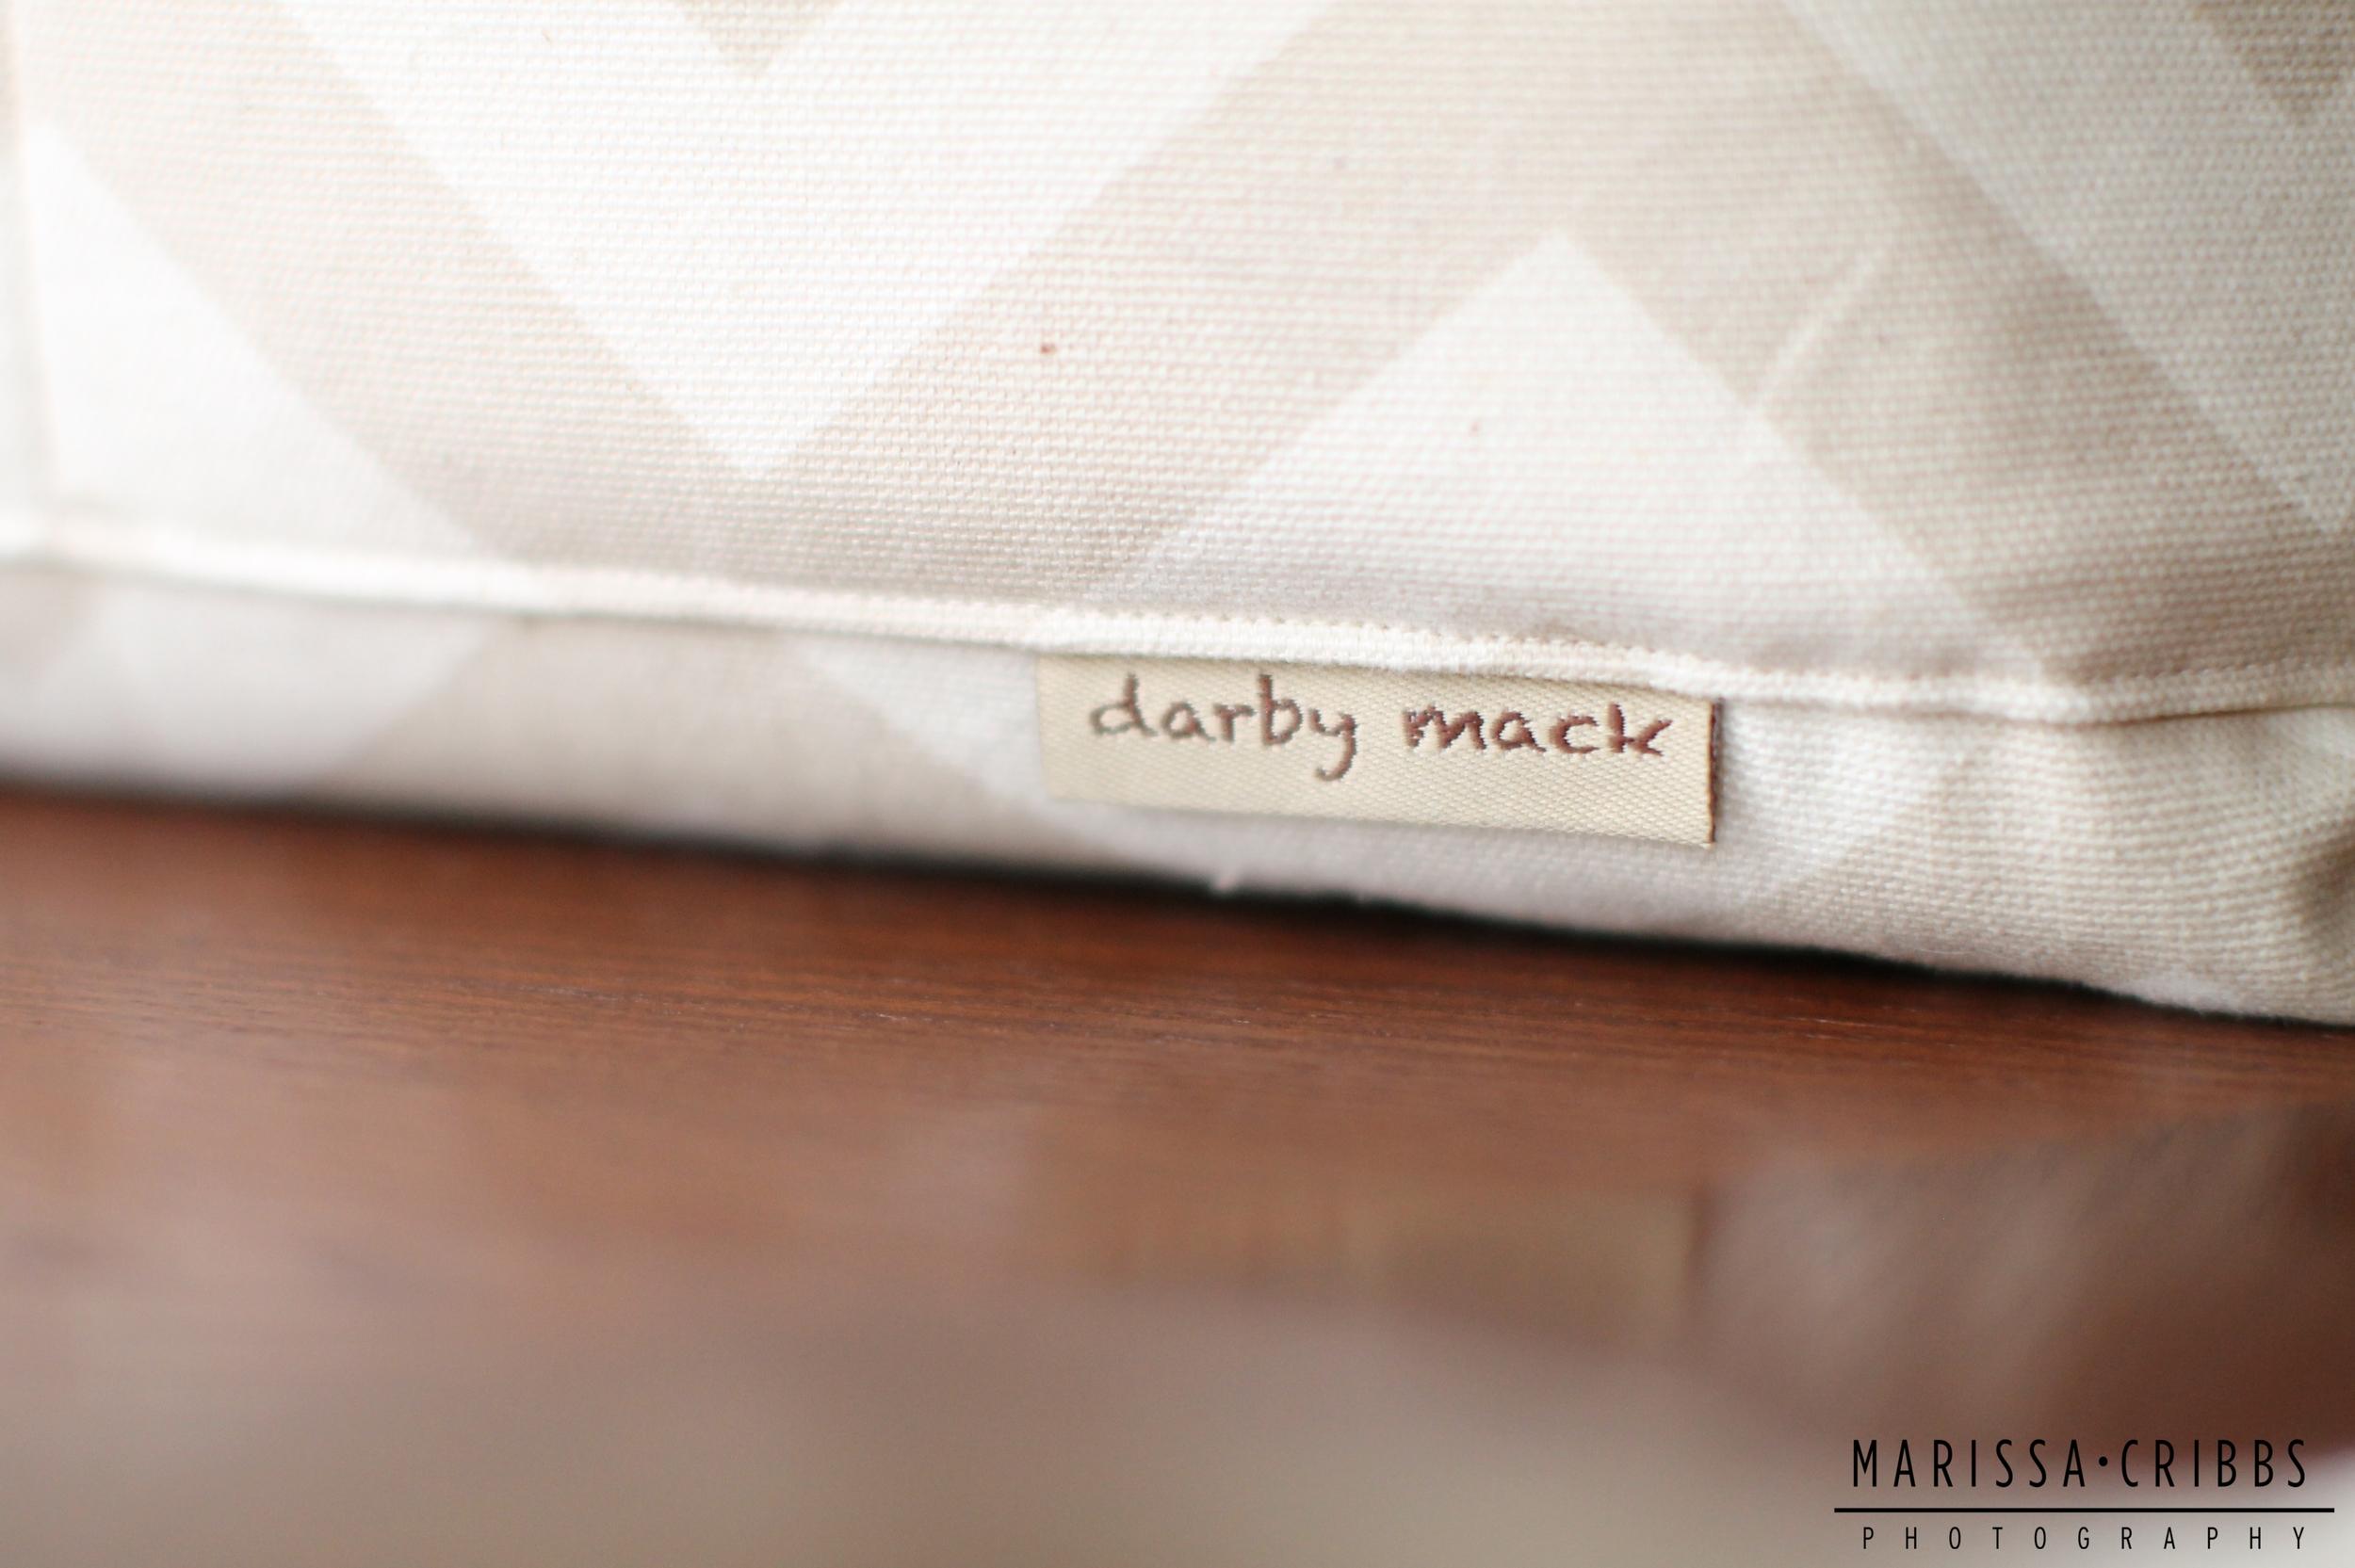 DarbyMack2.JPG